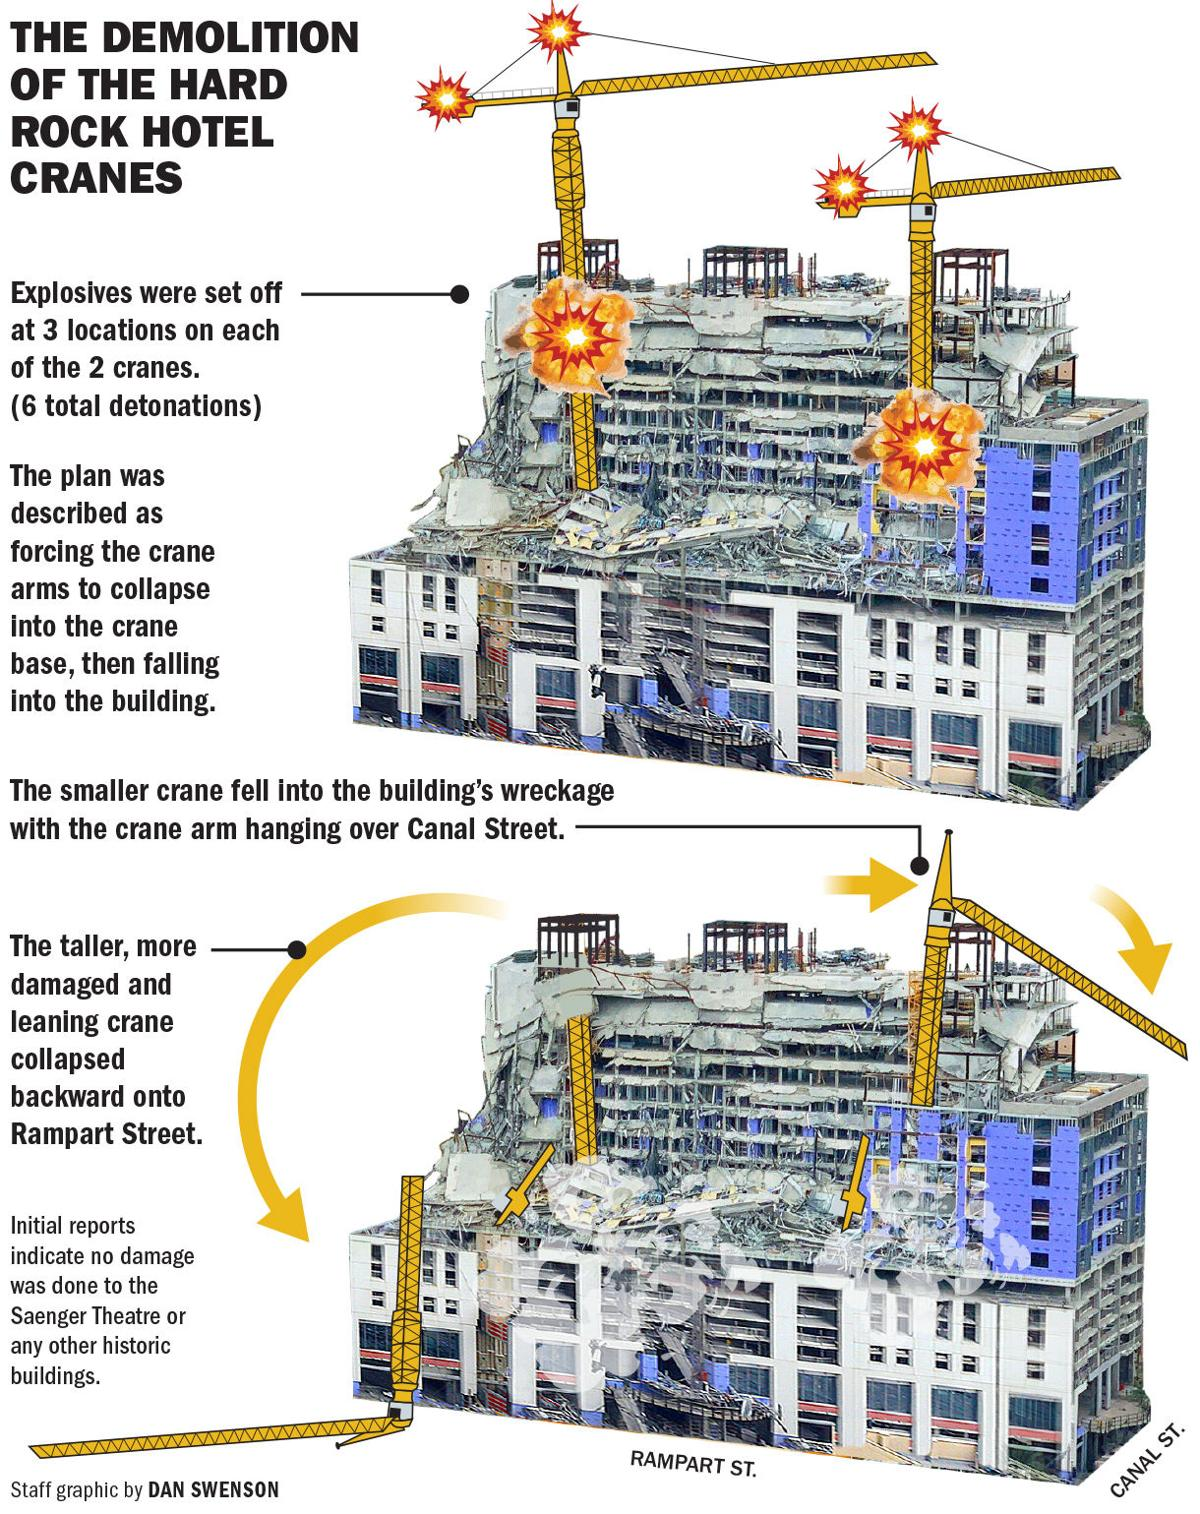 102119 Hard Rock Hotel Crane Demo